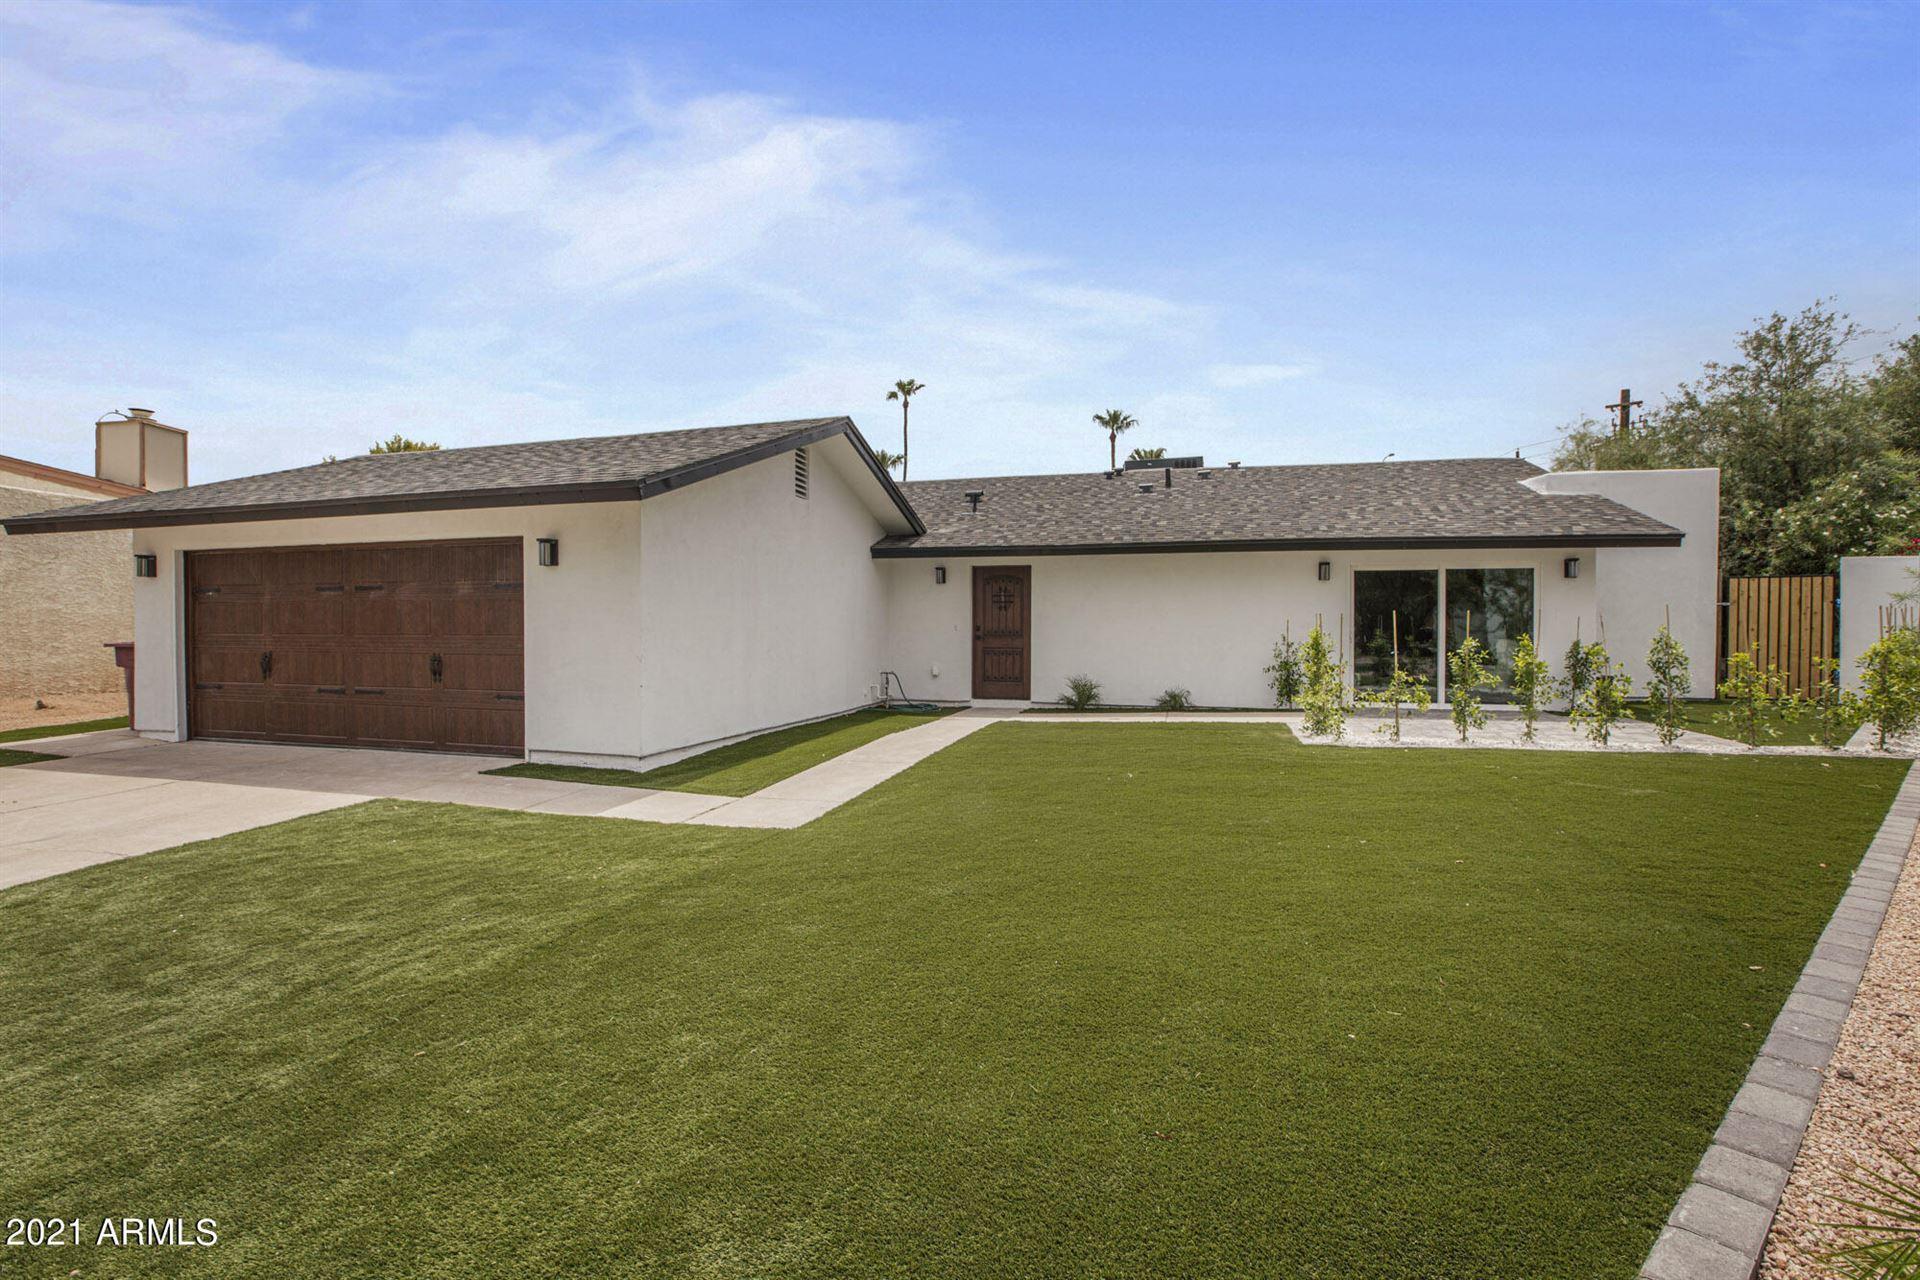 7719 E ROVEY Avenue, Scottsdale, AZ 85250 - MLS#: 6227382